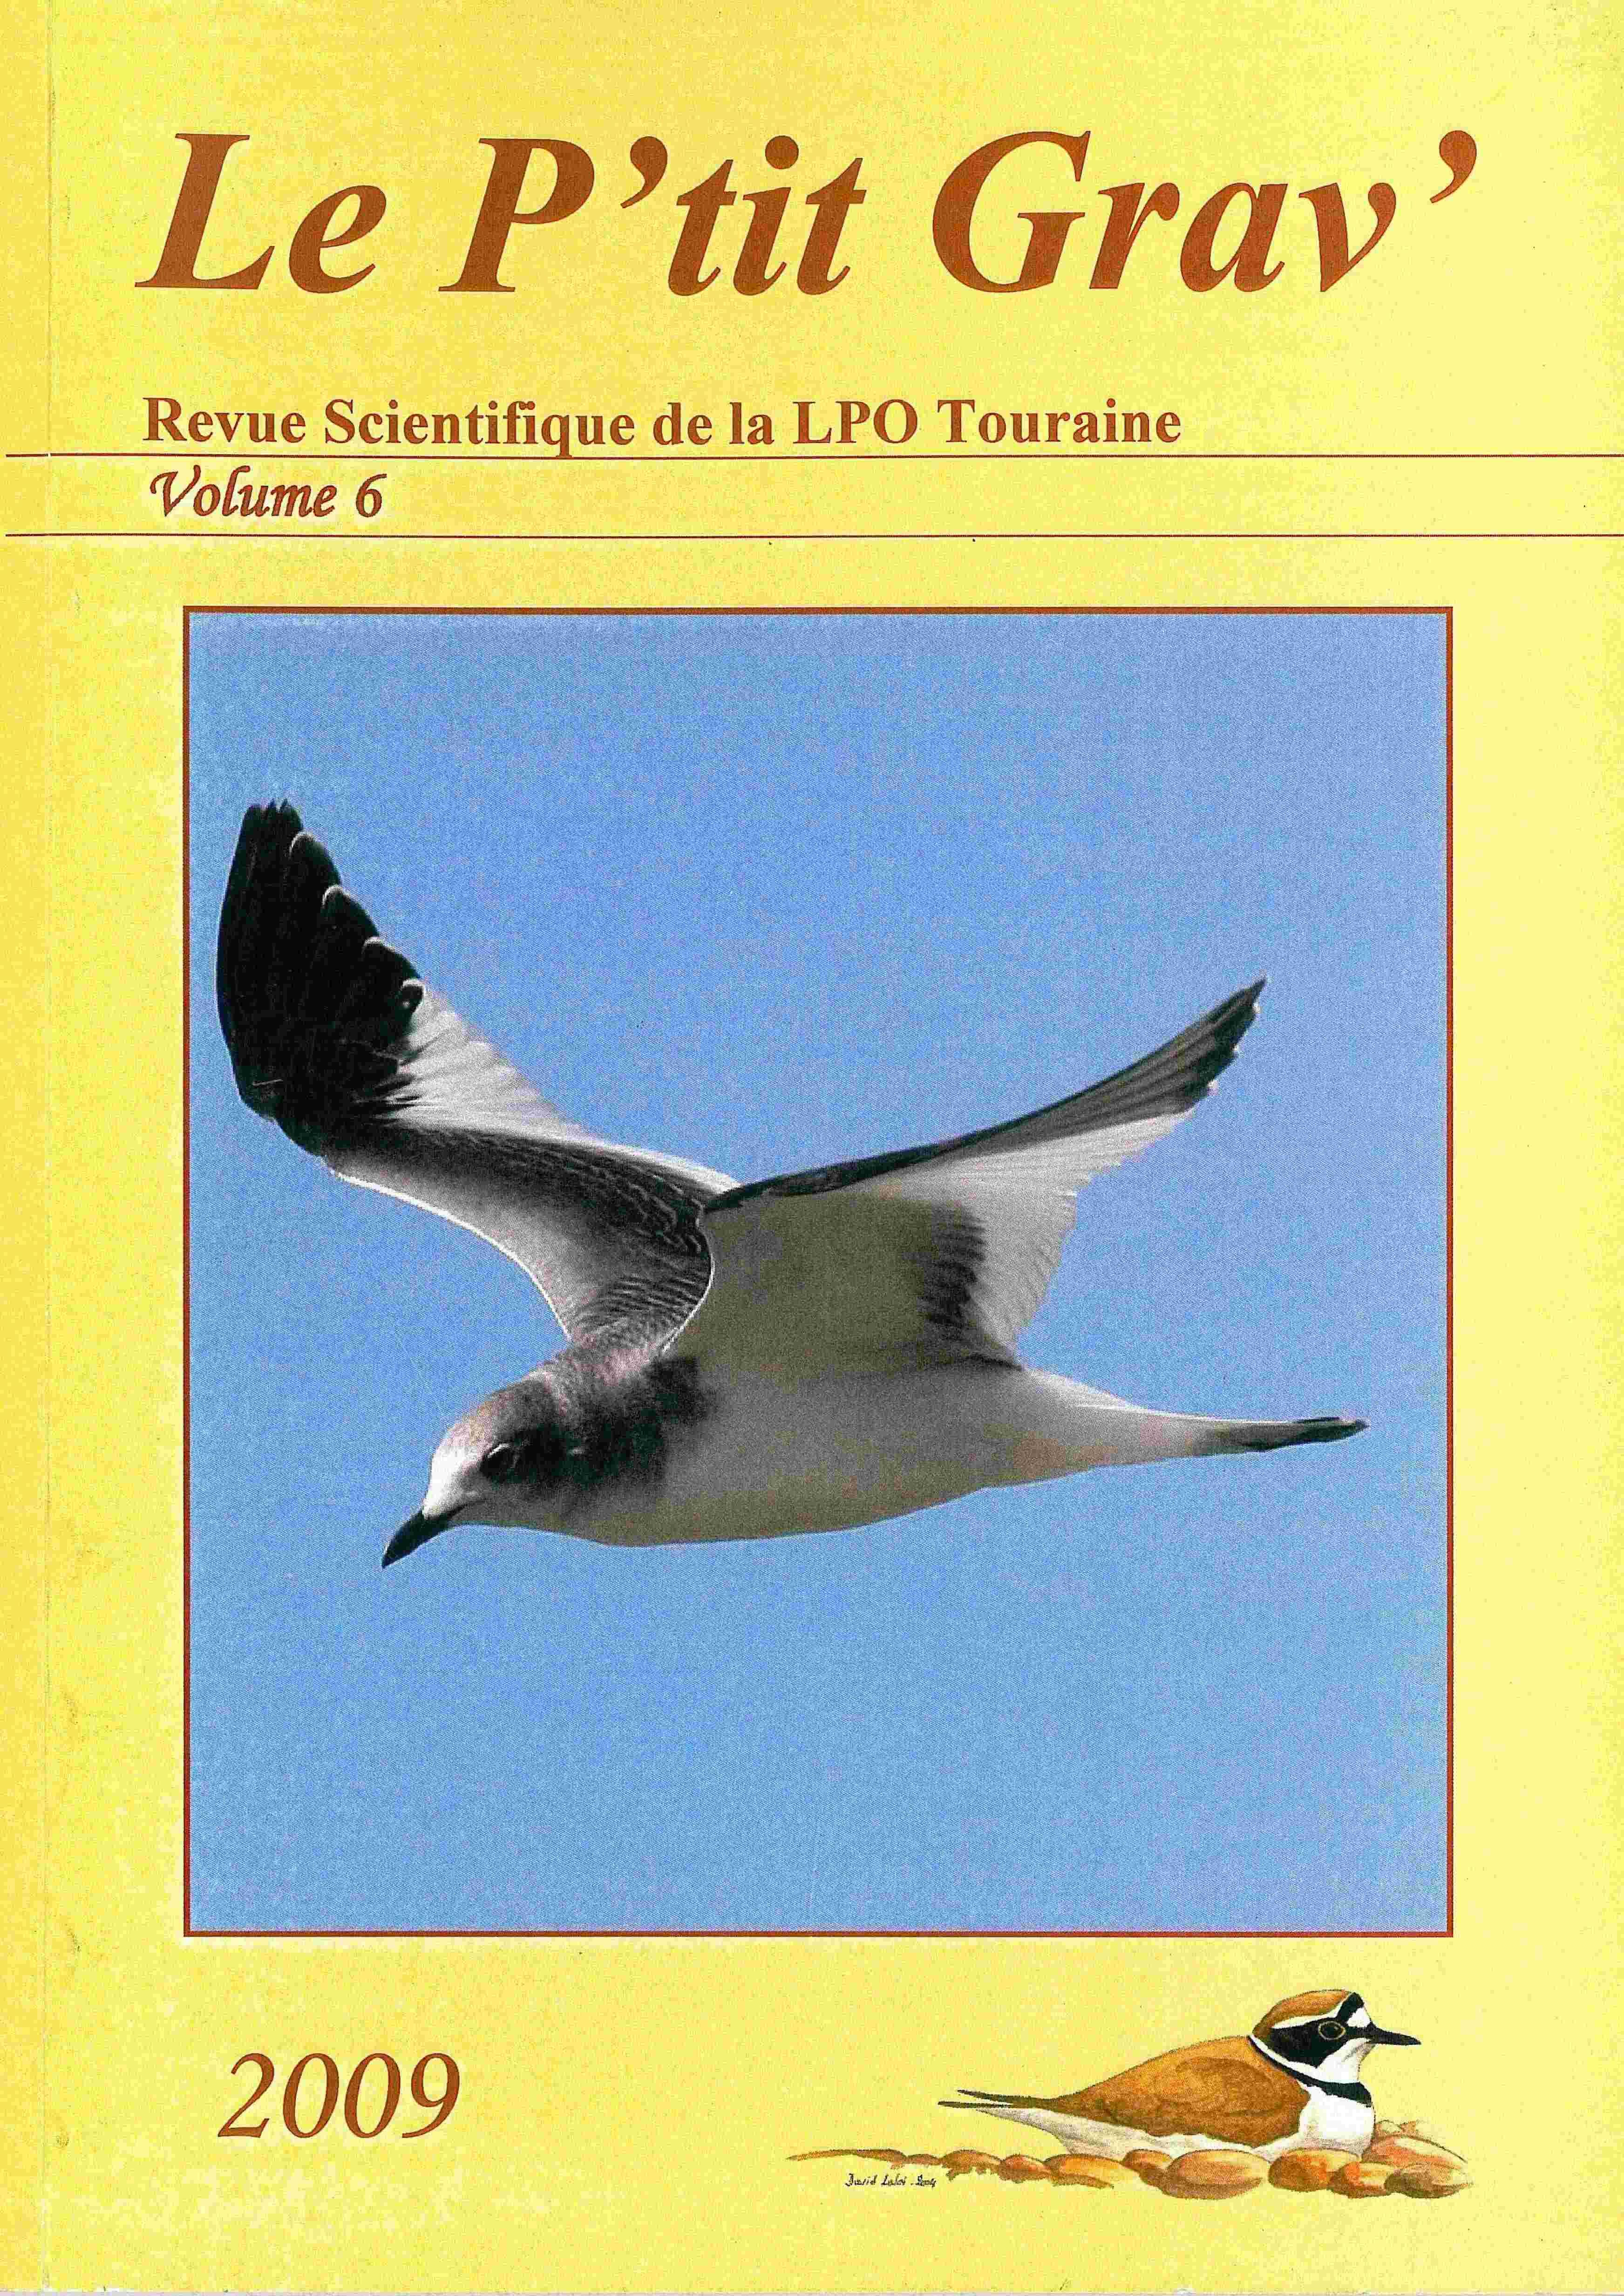 http://files.biolovision.net/www.faune-touraine.org/userfiles/MonDossier/PtitGravvol6.jpg